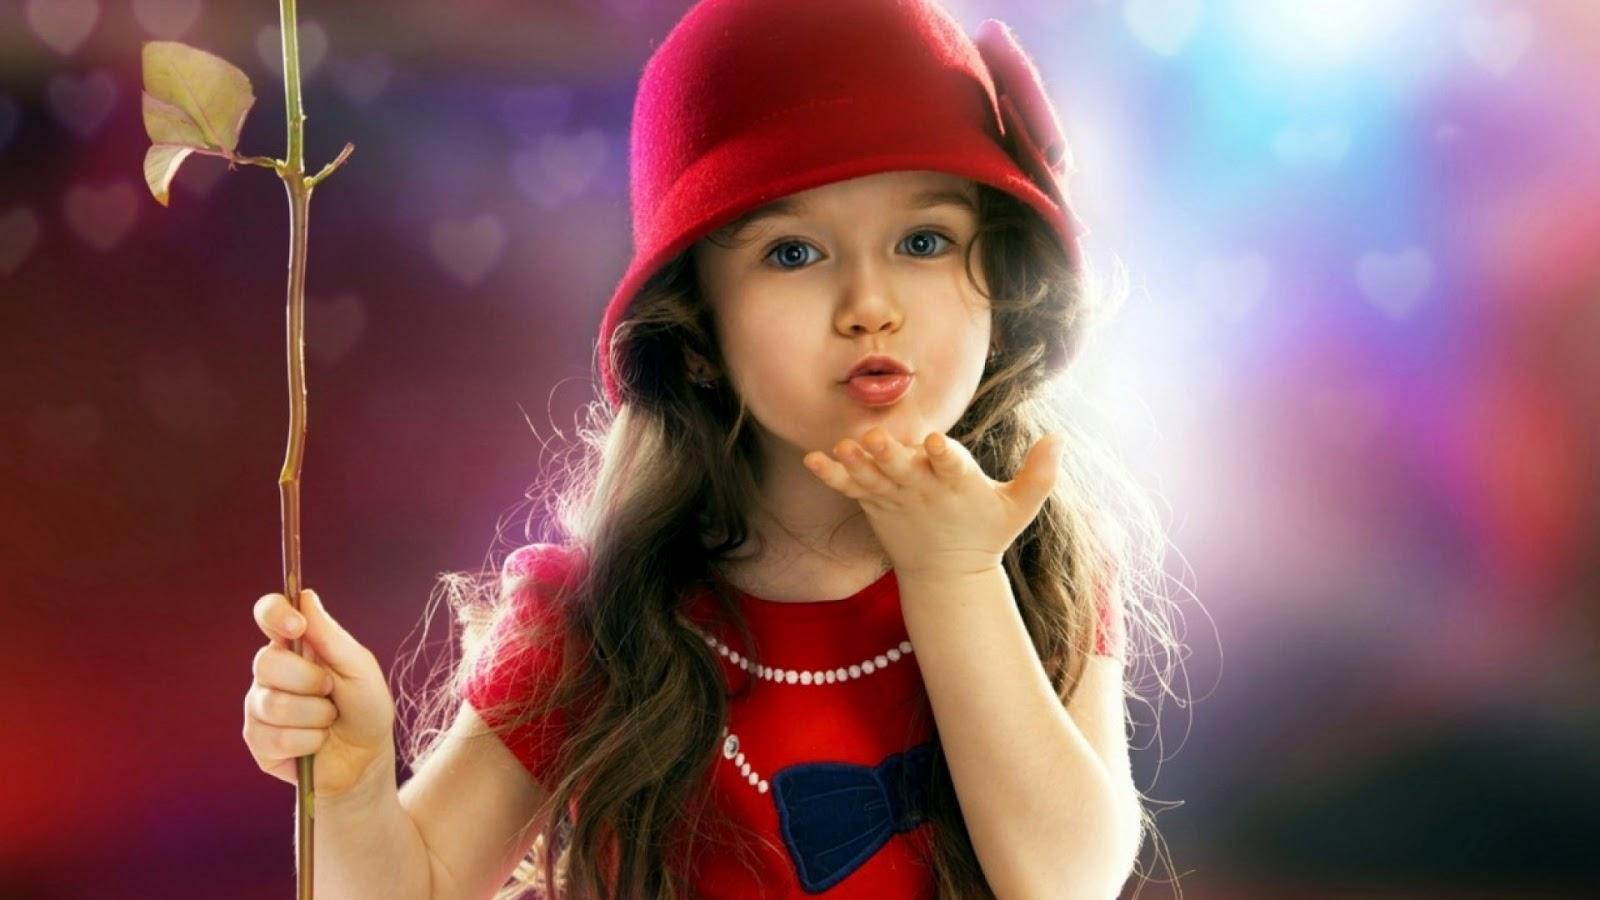 download cute baby girl hd wallpapers ~ hd wallpaper online